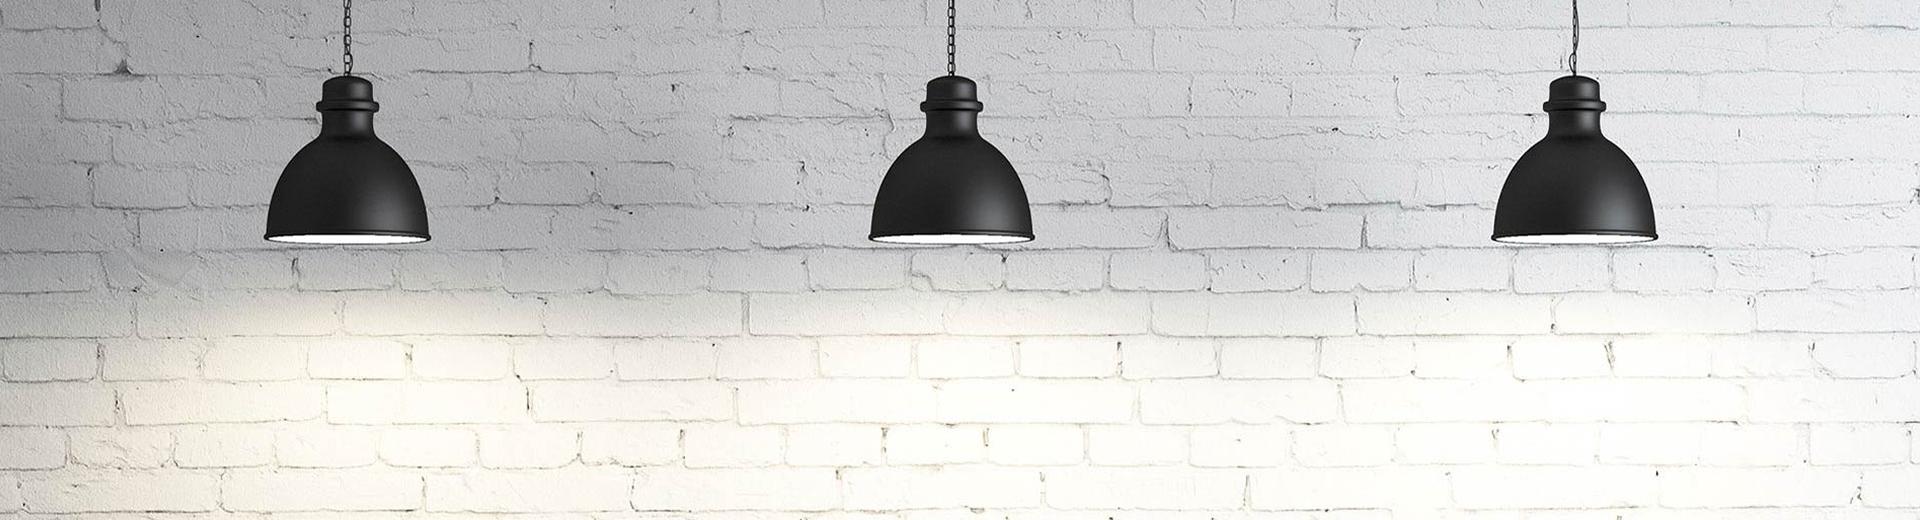 Lampen im Loft